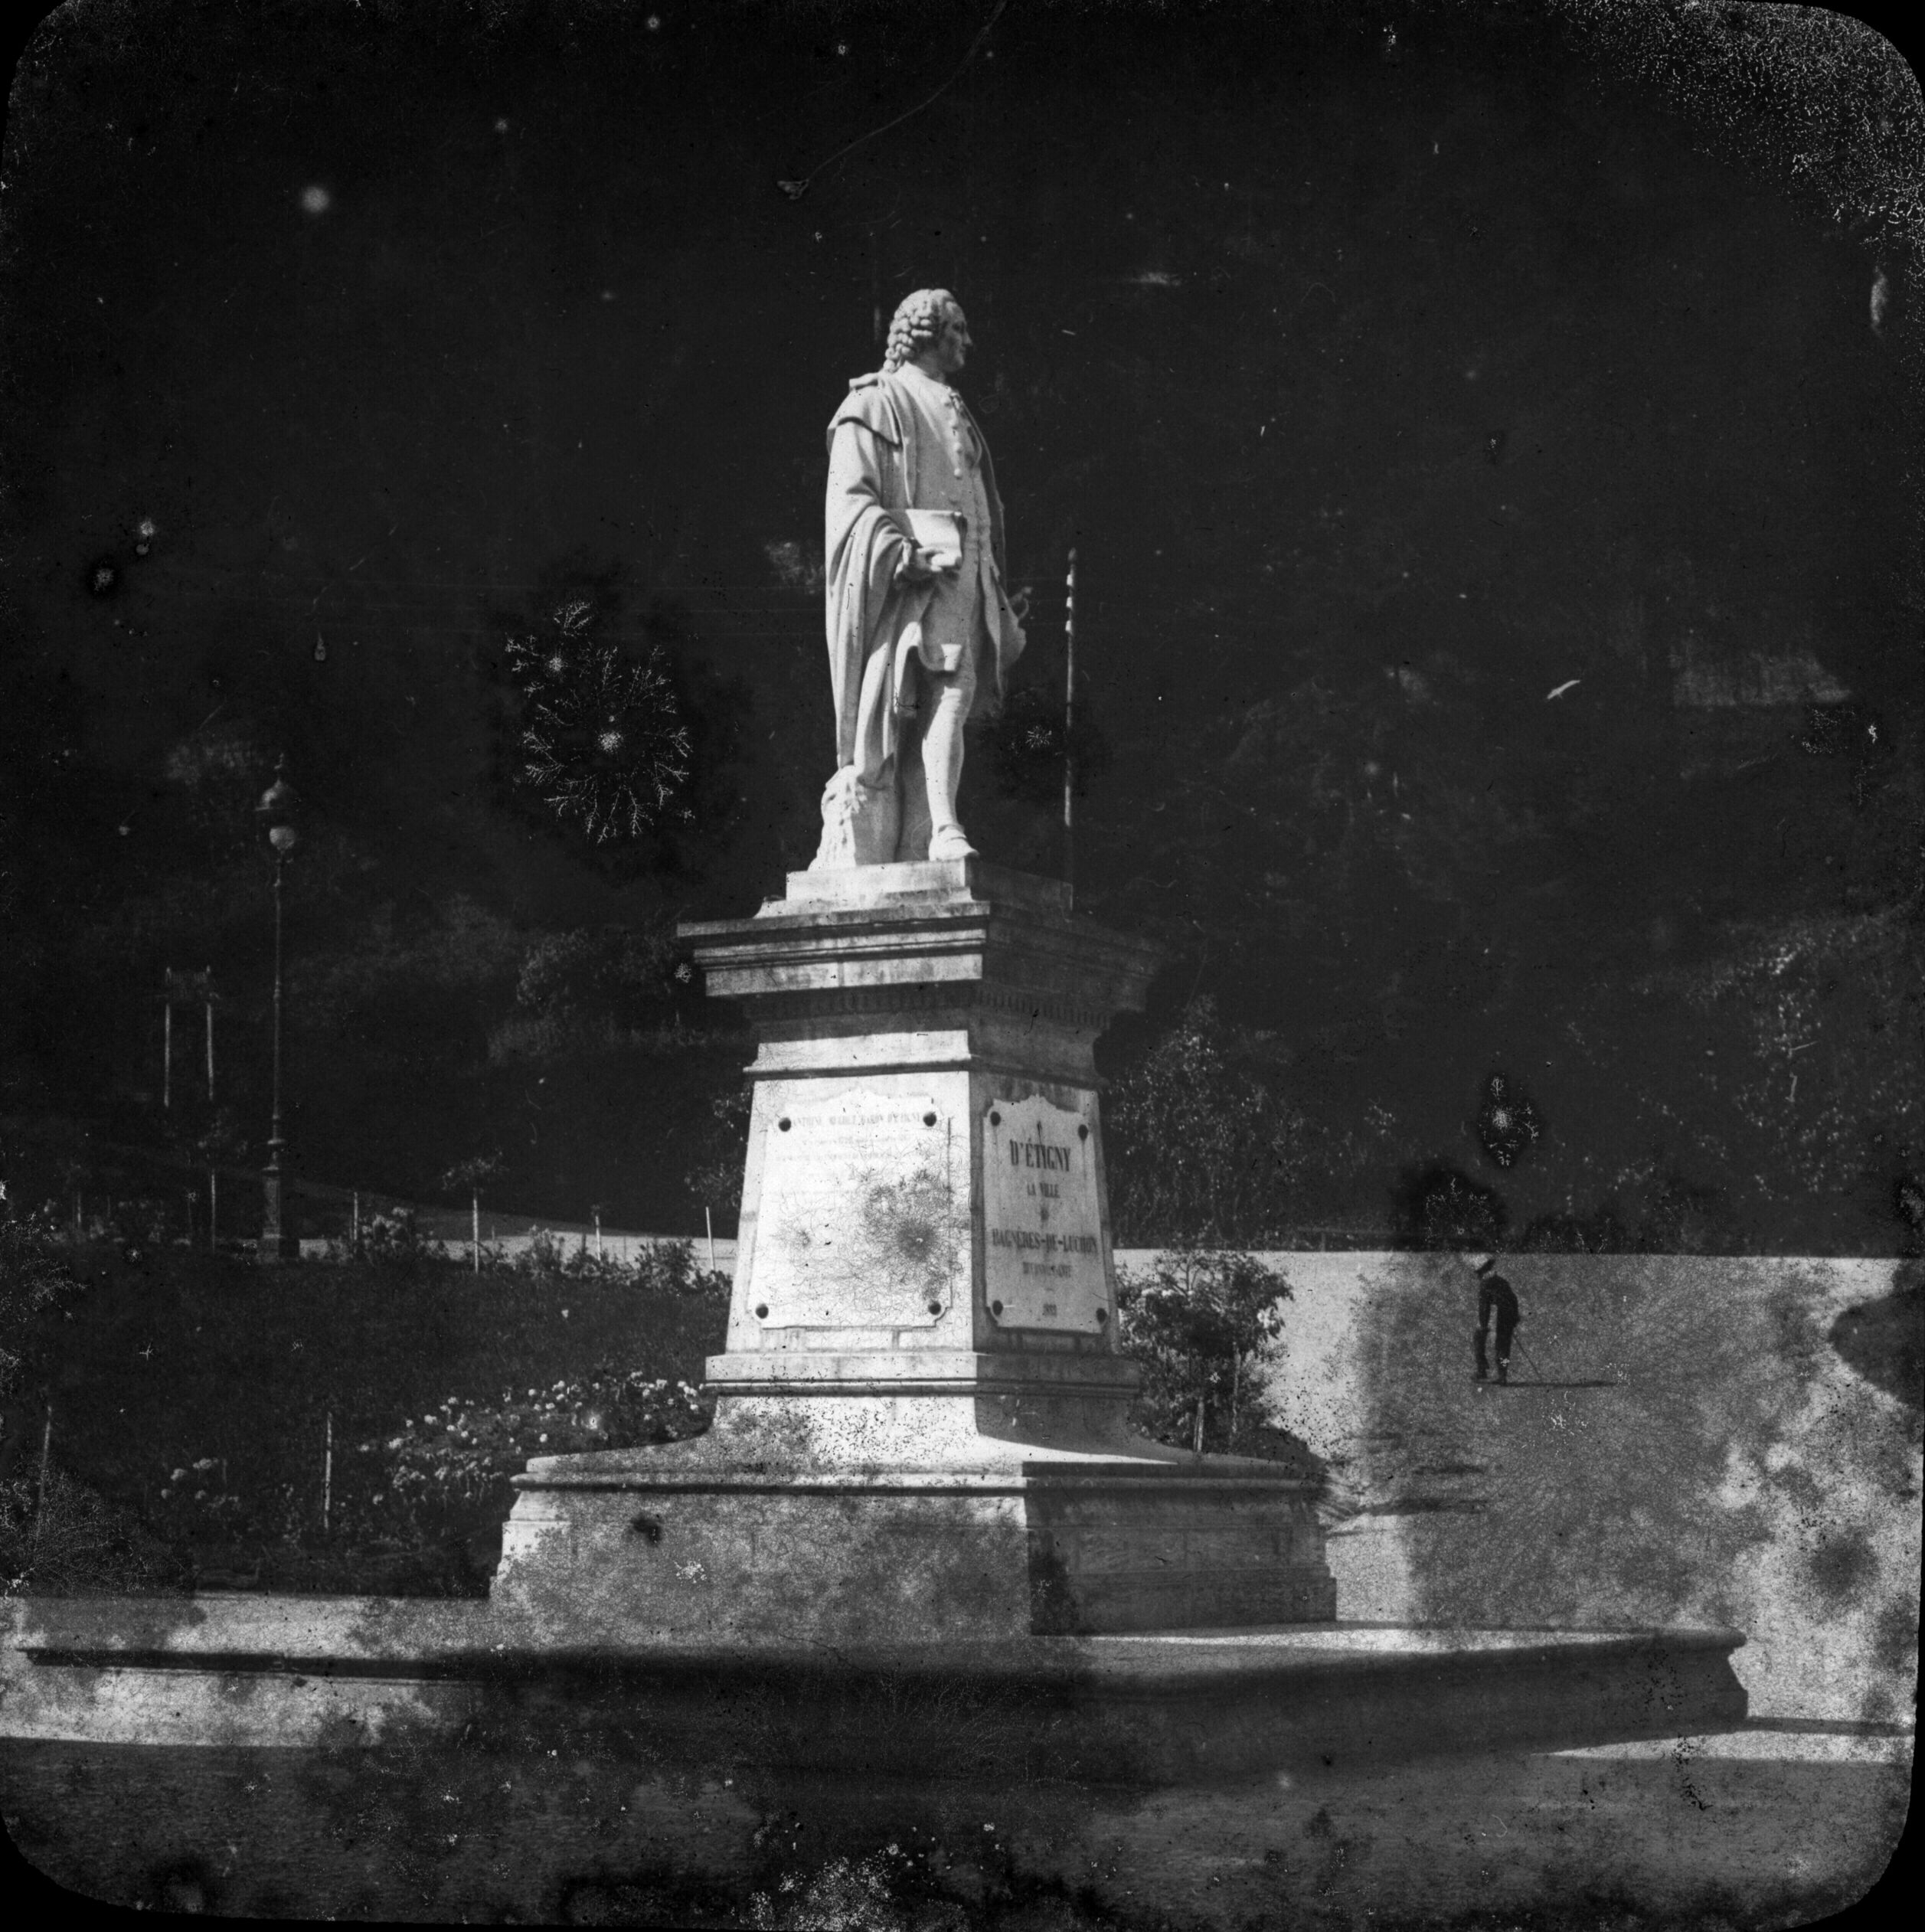 Statue de d'Etigny, Luchon